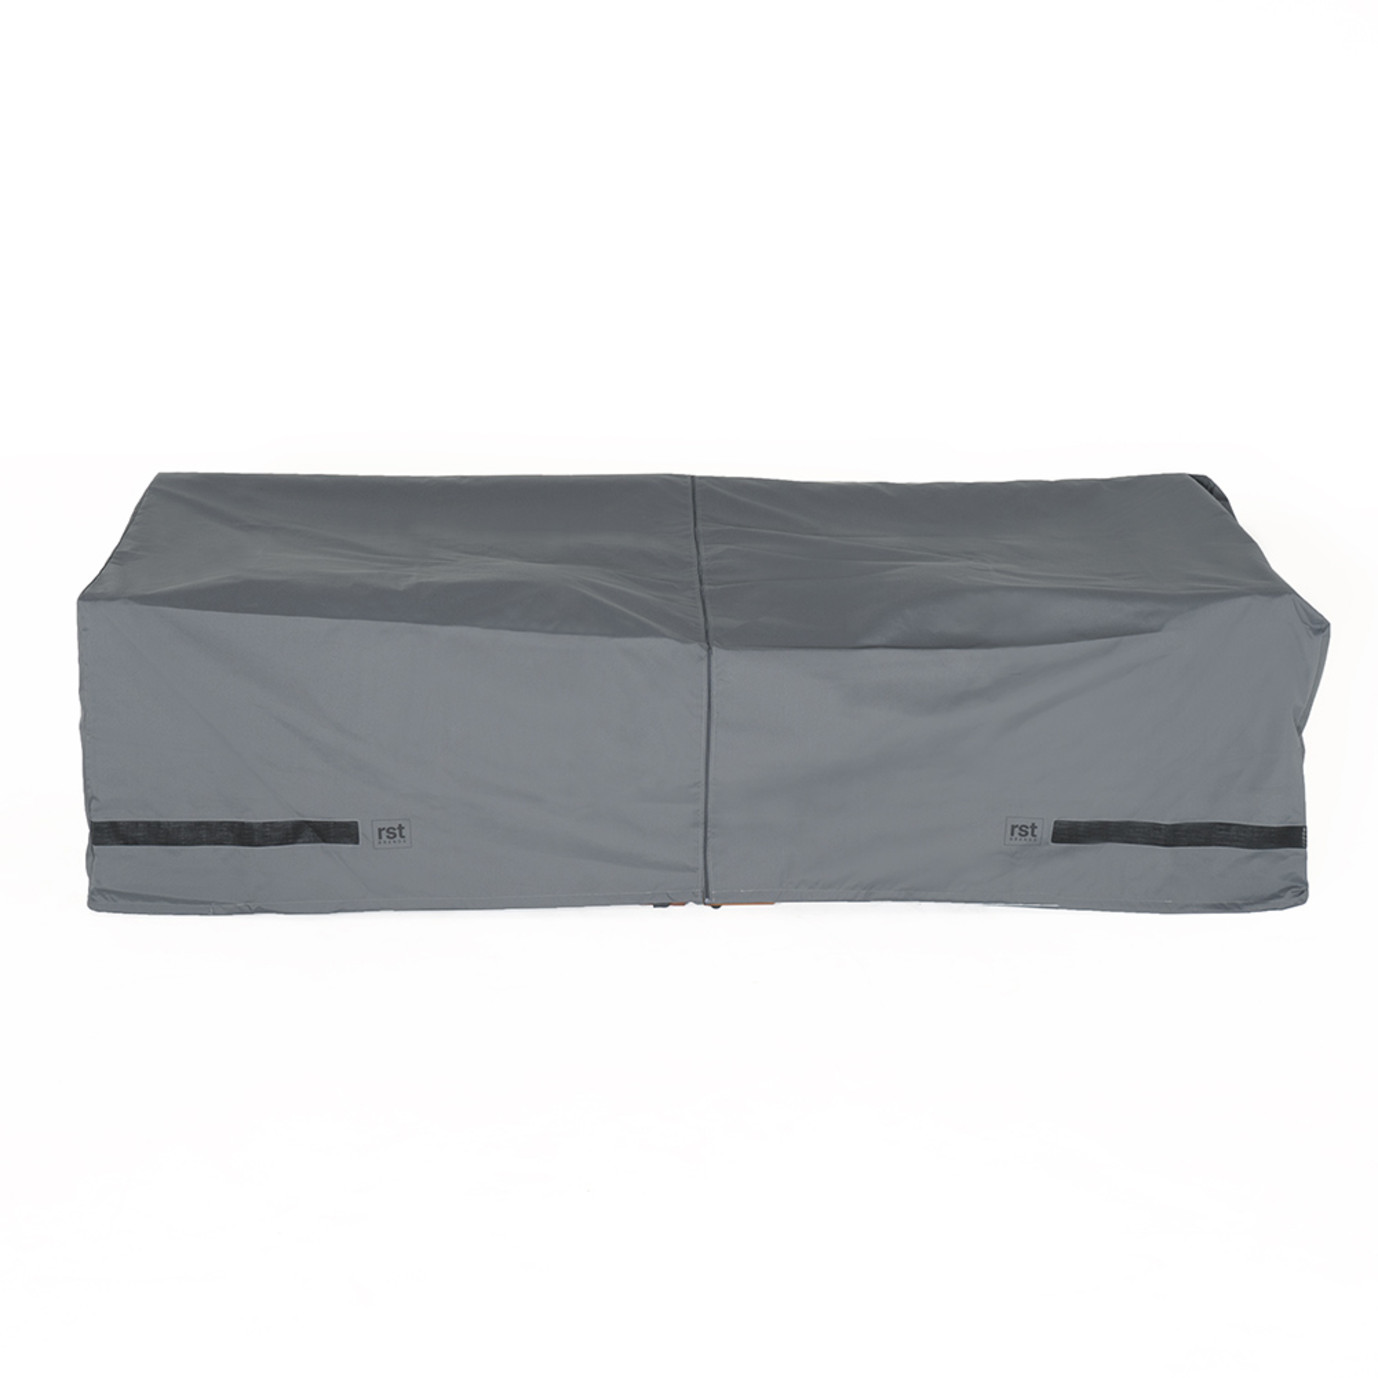 Resort™ Furniture Cover - 2pc 96in Sofa